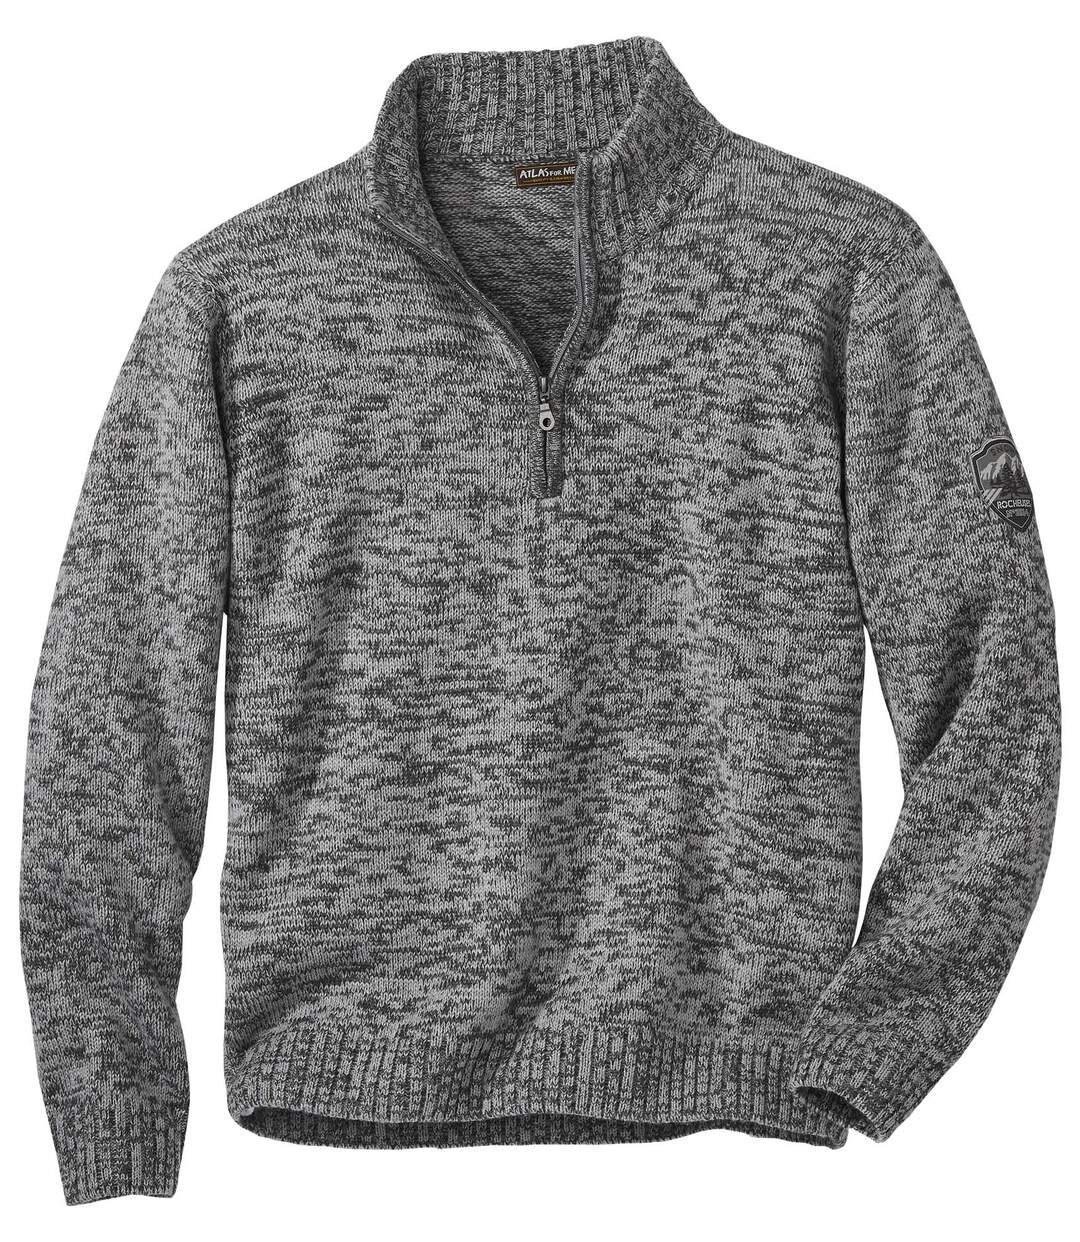 Strakatý svetr s rolákem